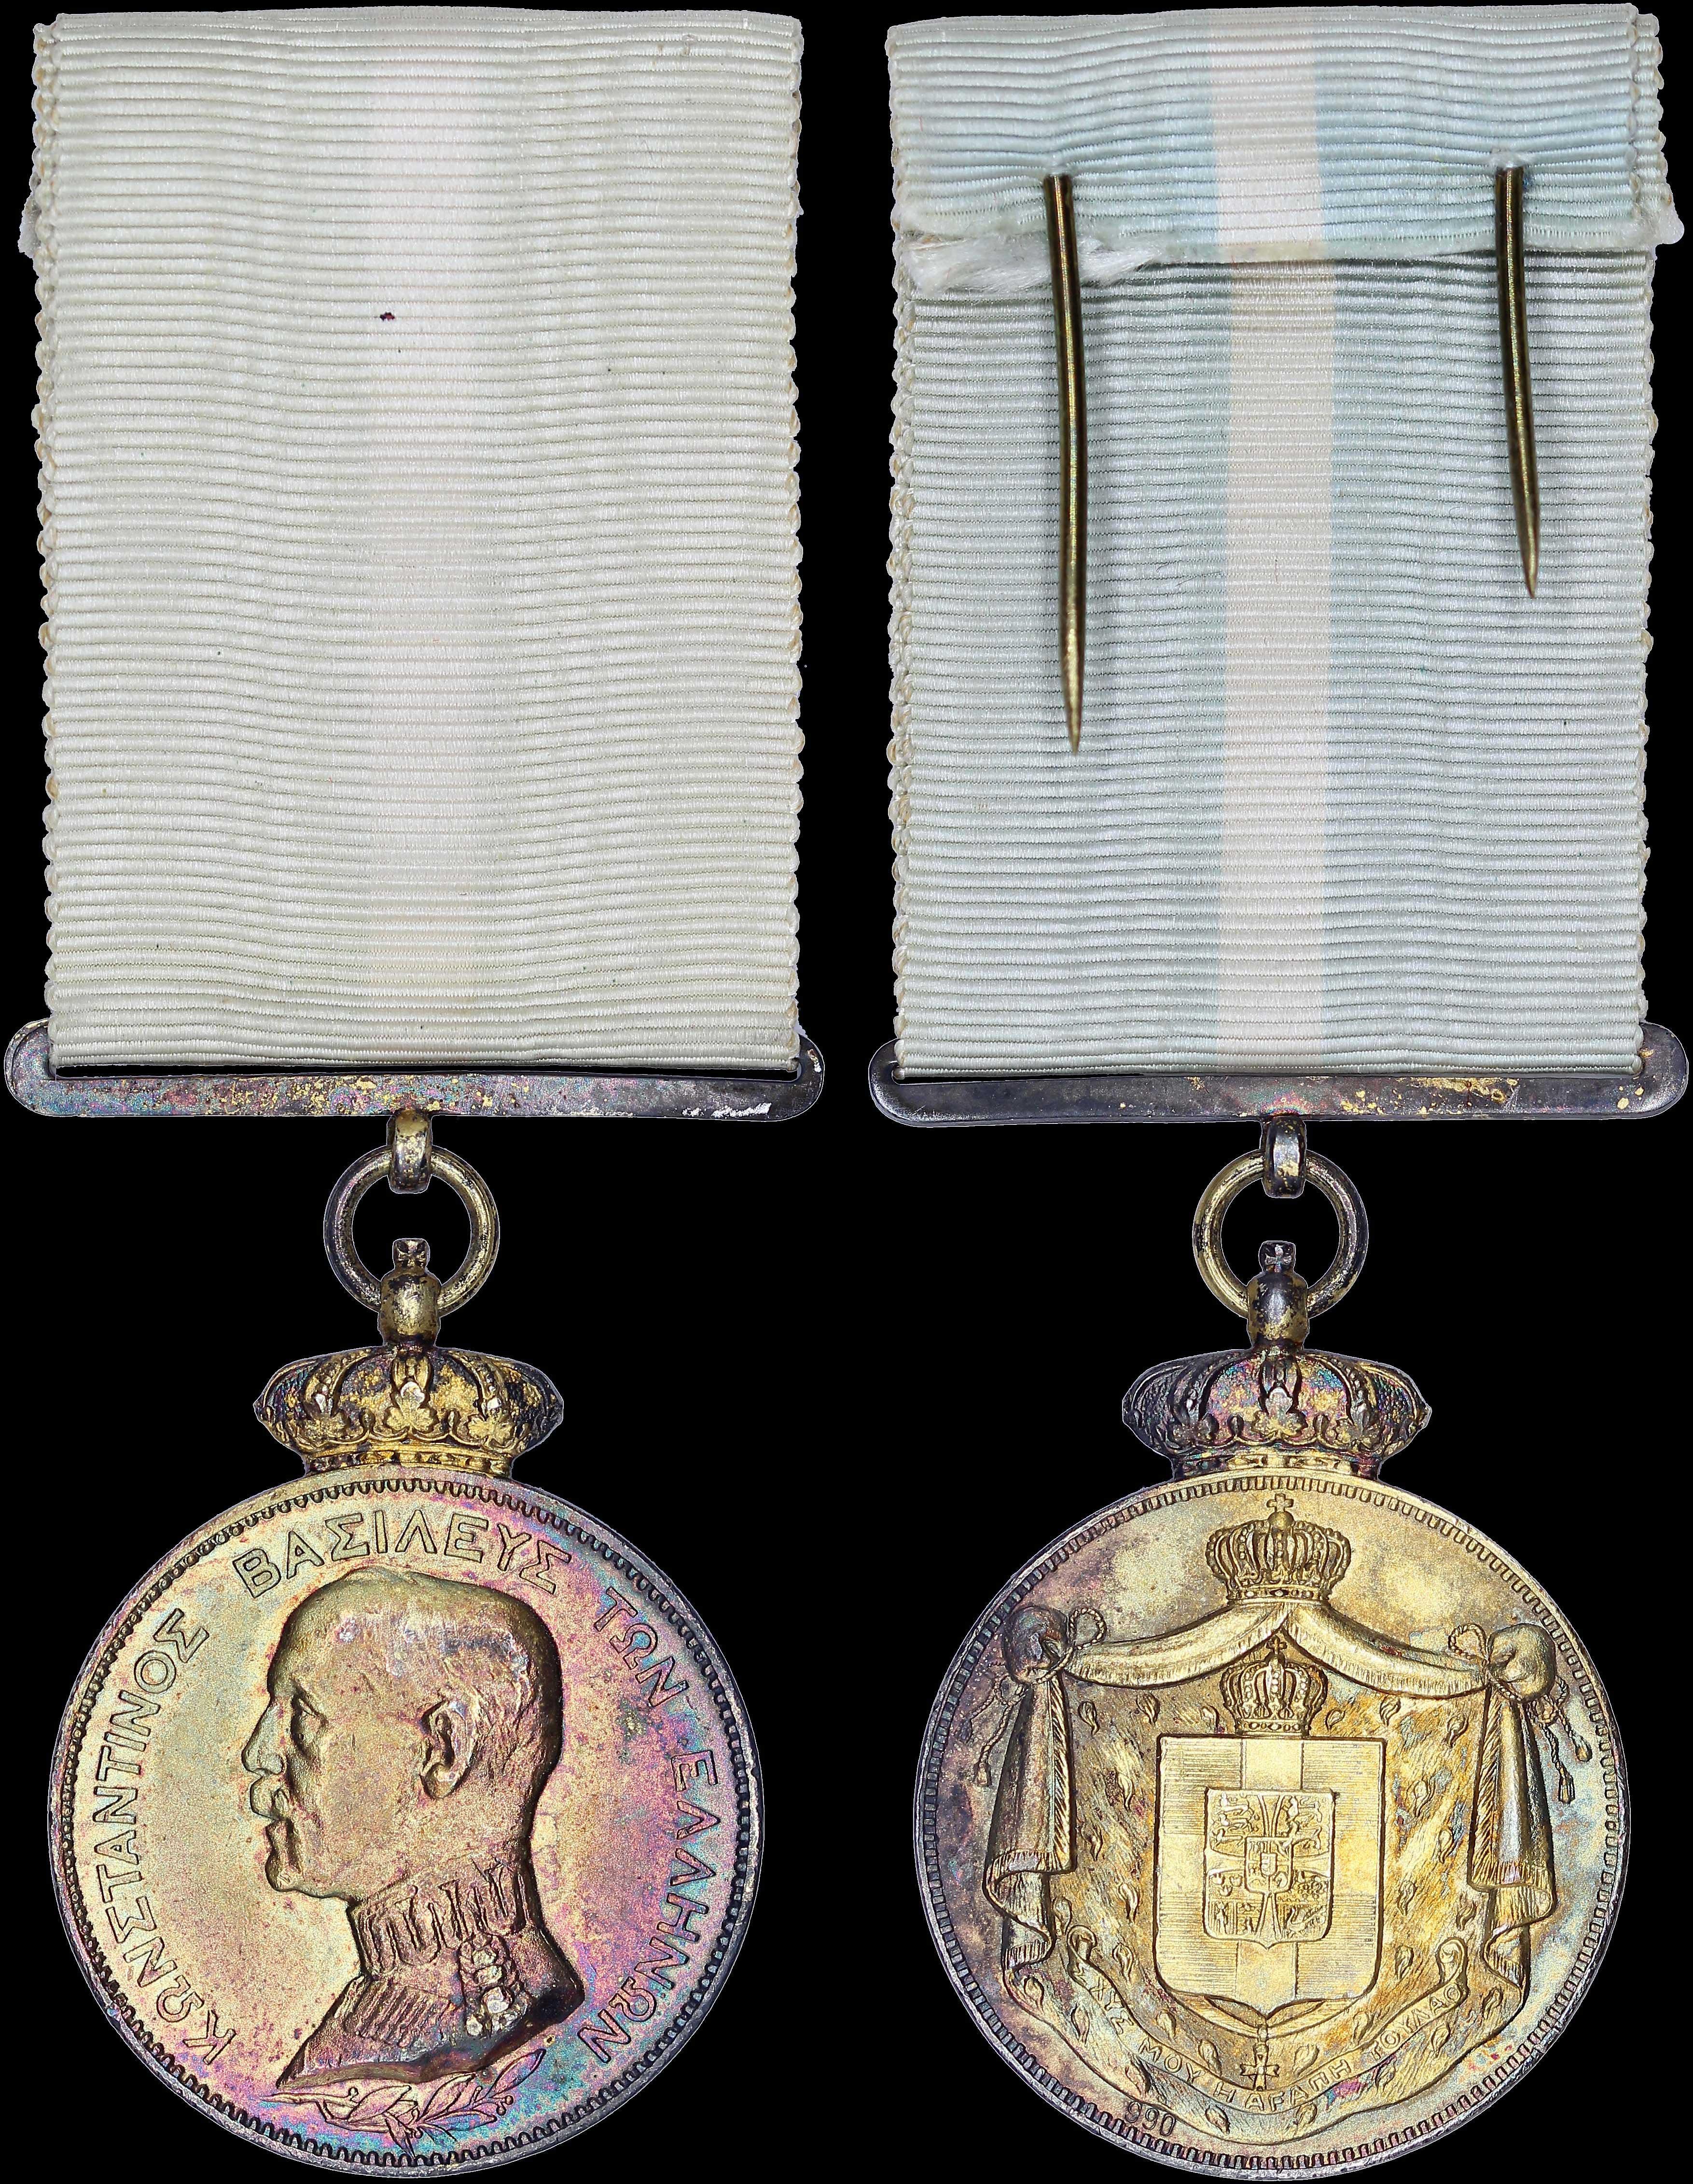 Lot 6658 - -  MEDALS & DECORATIONS GREEK MILITARY MEDALS & DECORATIONS -  A. Karamitsos Public & Live Internet Auction 682 (Part A) Coins, Medals & Banknotes